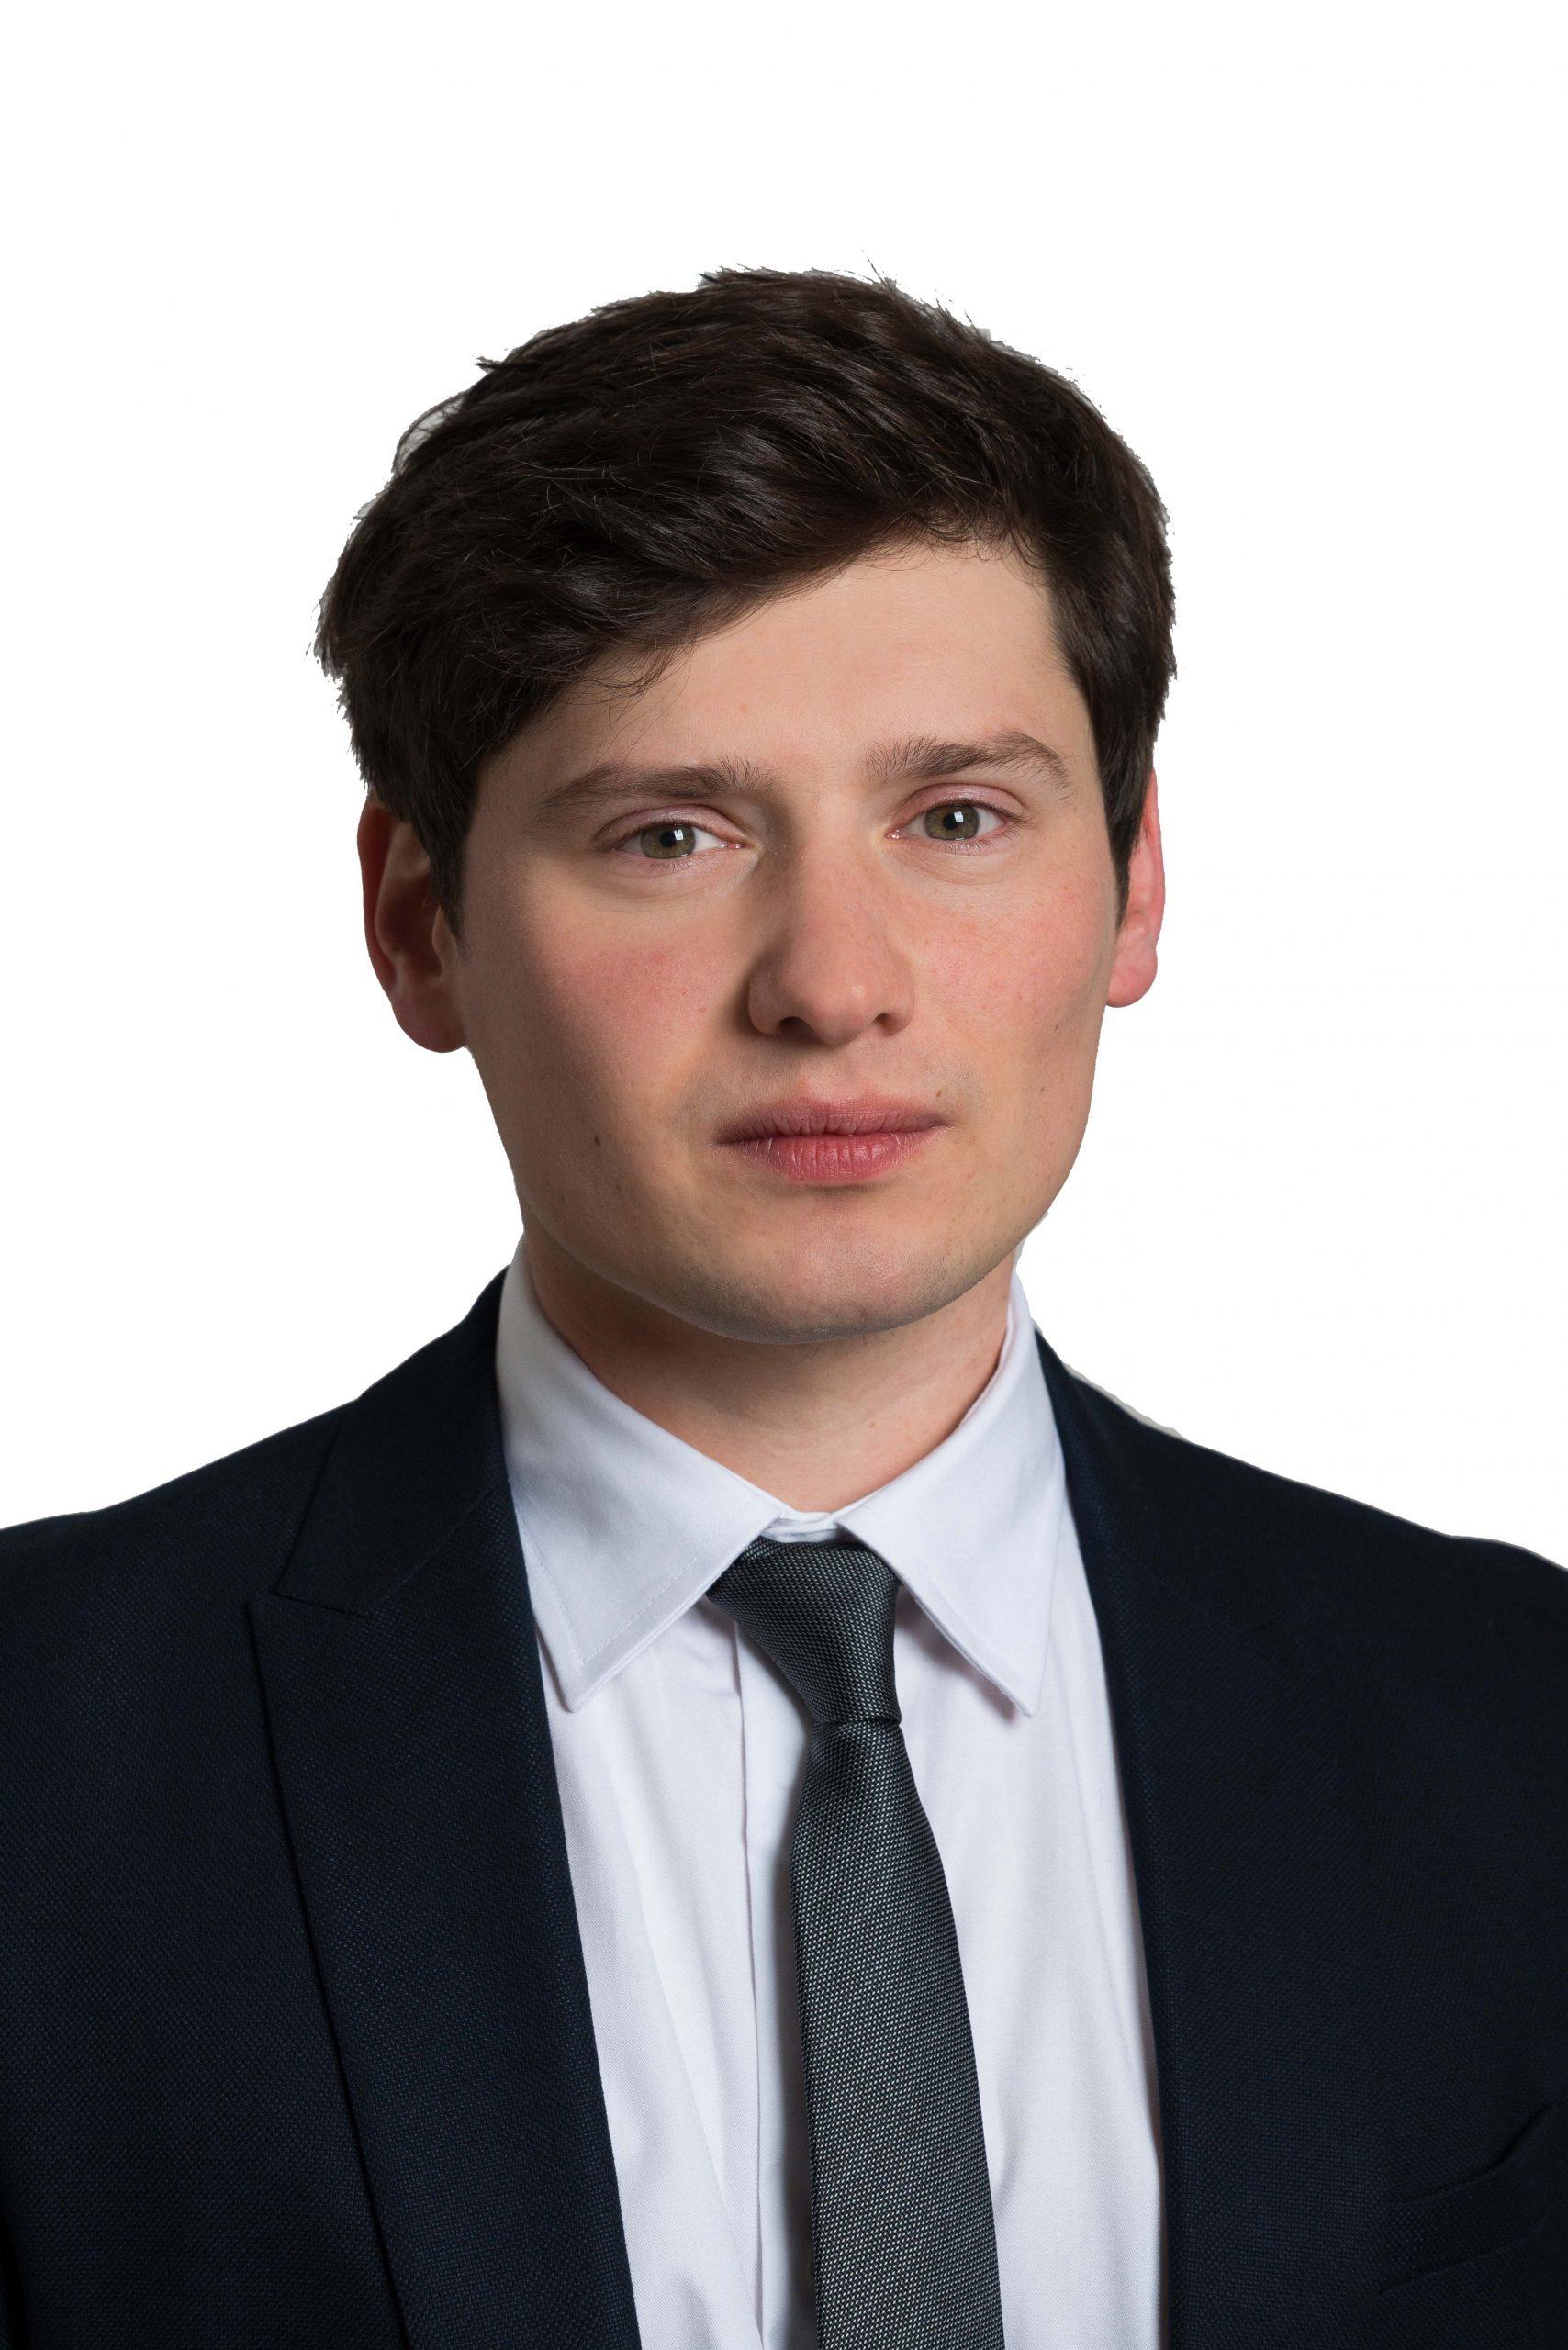 Daniel Purchase